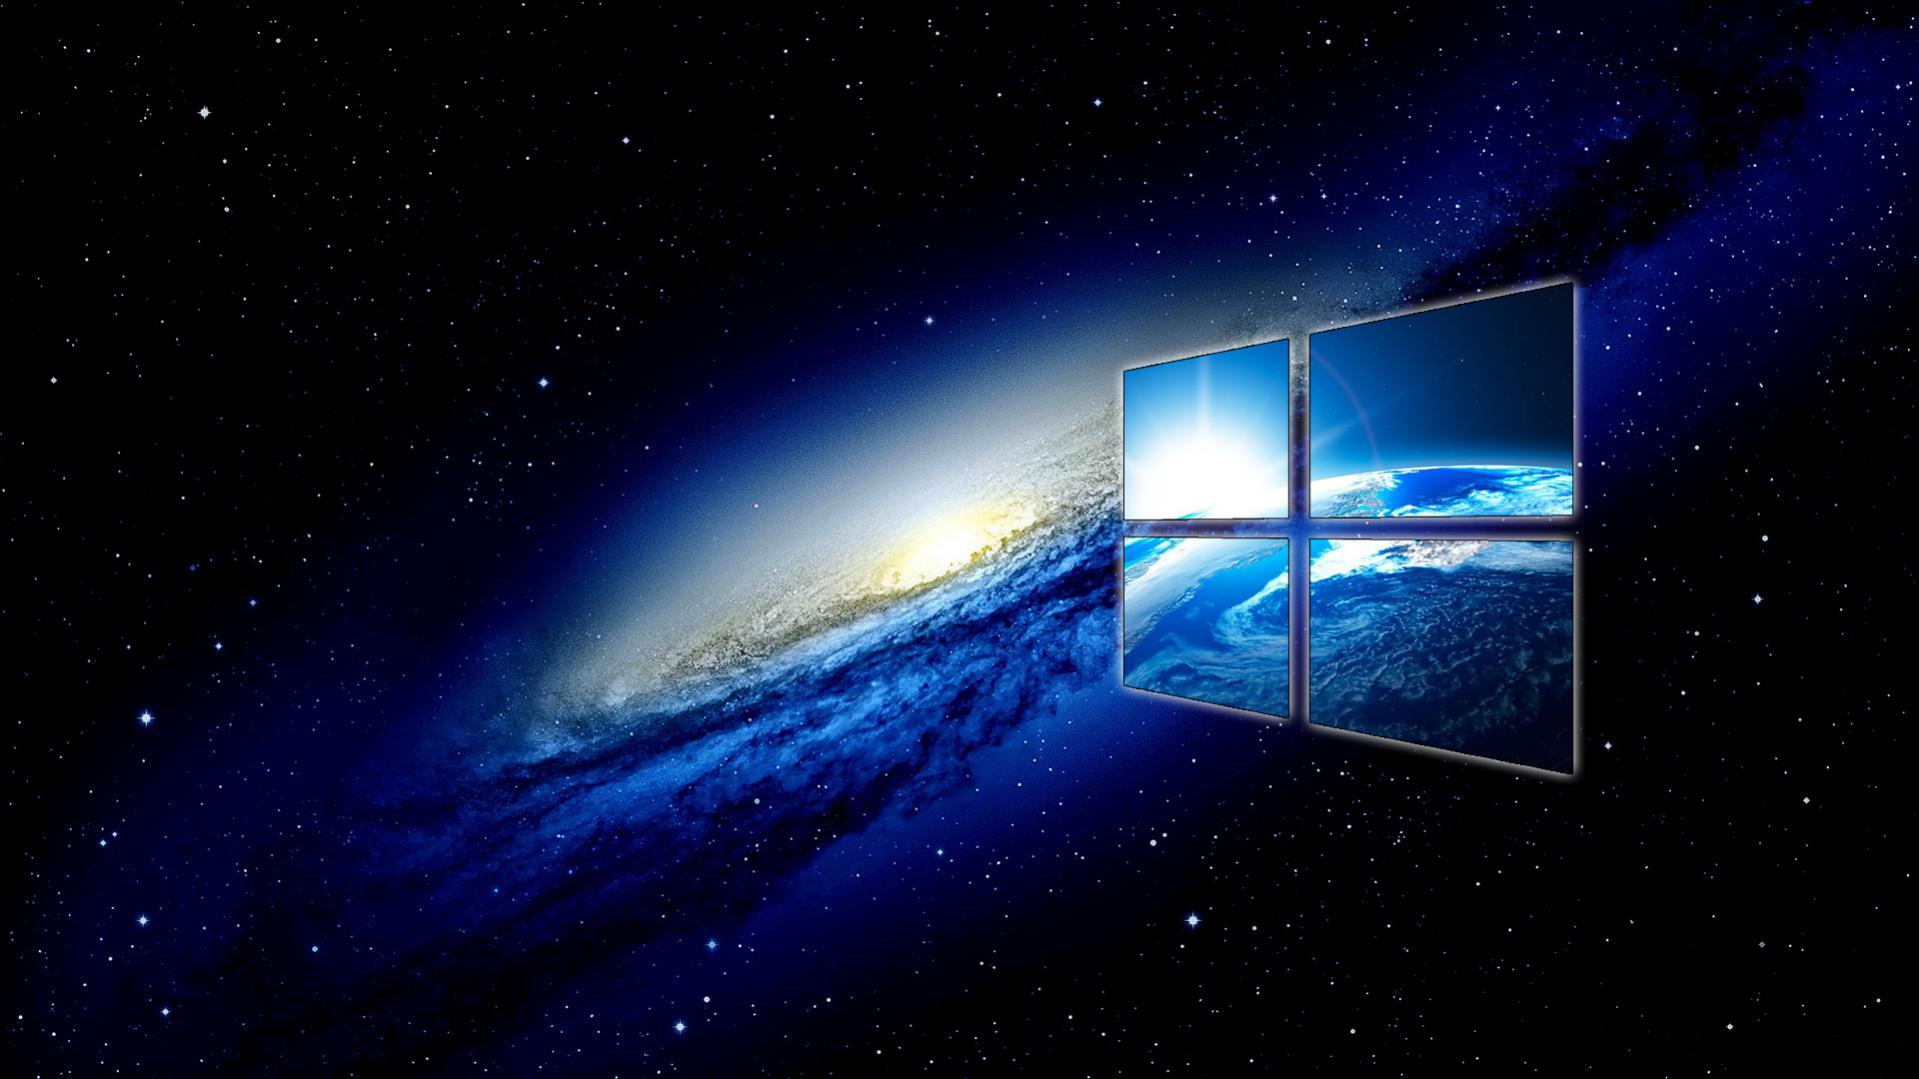 Download Windows 10 Amazing Wallpaper Z239e Wallniku Hd Wallpaper